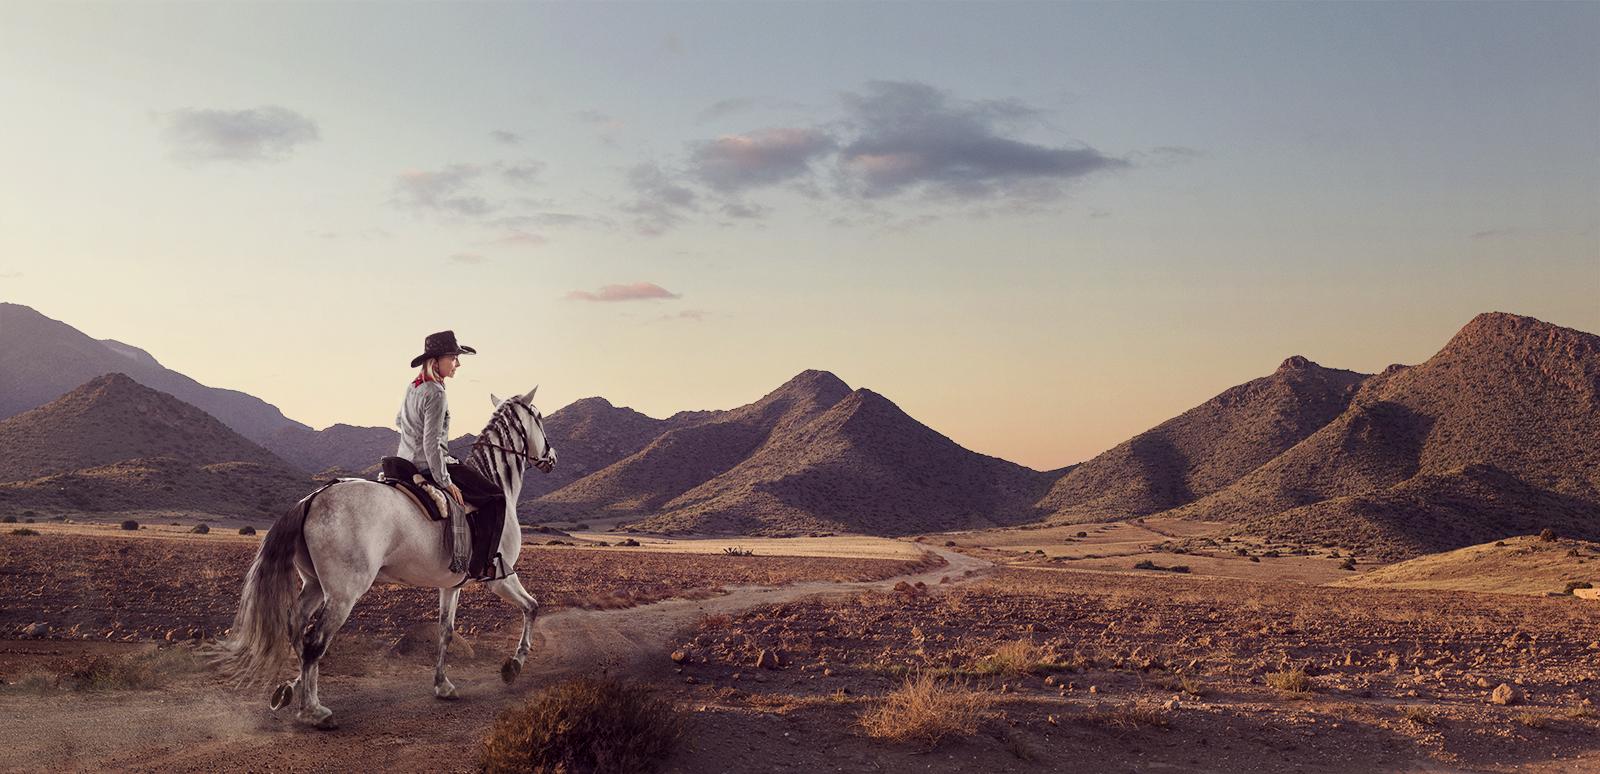 horse_xabier aldazabal photo.jpg